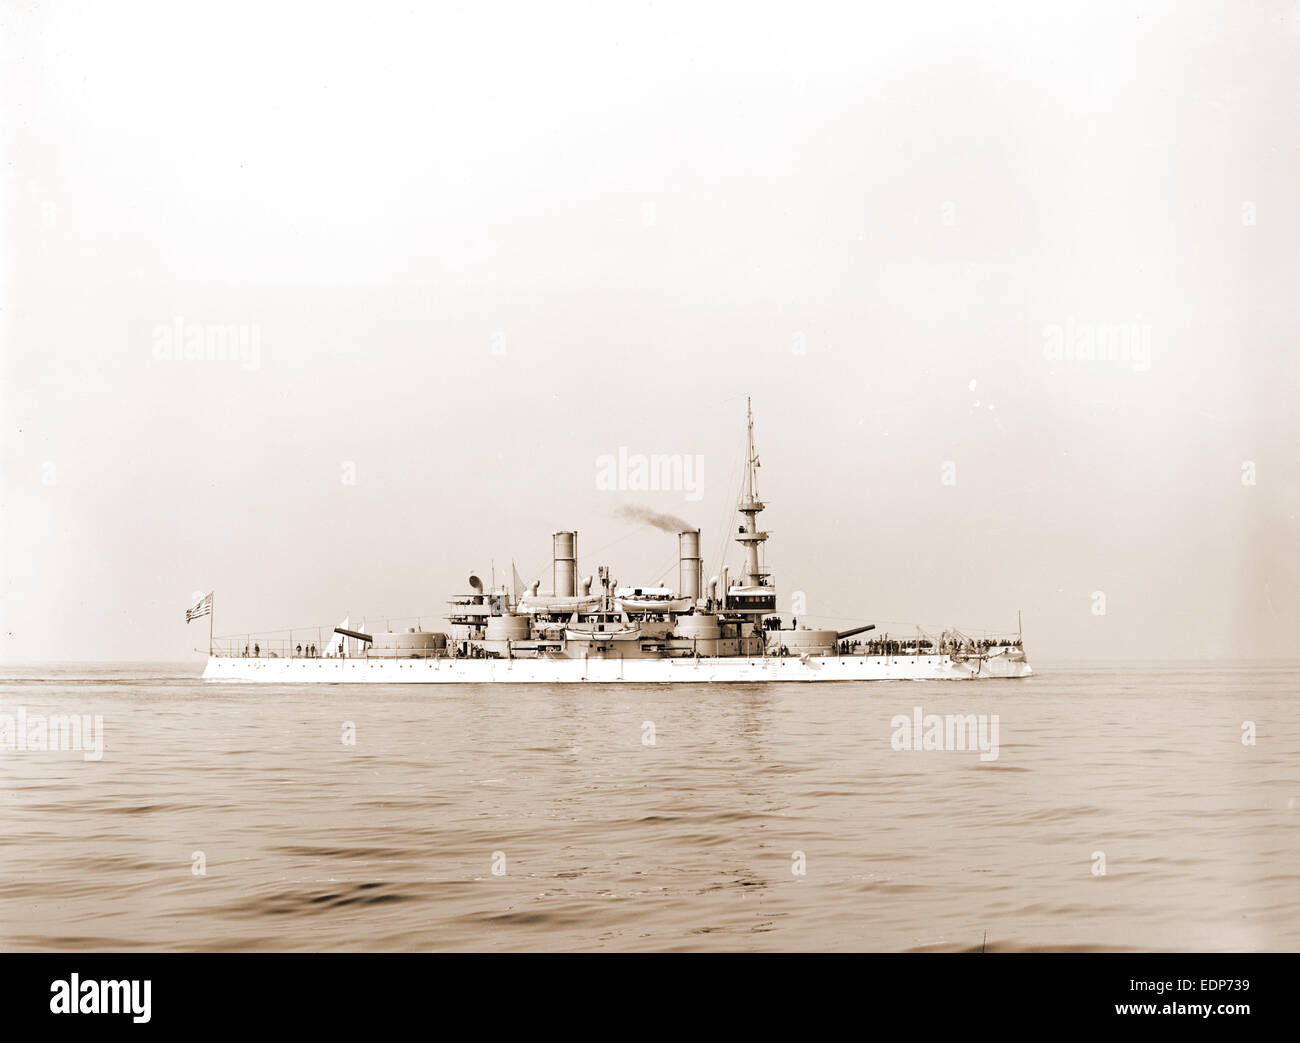 U.S.S. Indiana, Indiana (Battleship), Battleships, American, 1899 - Stock Image